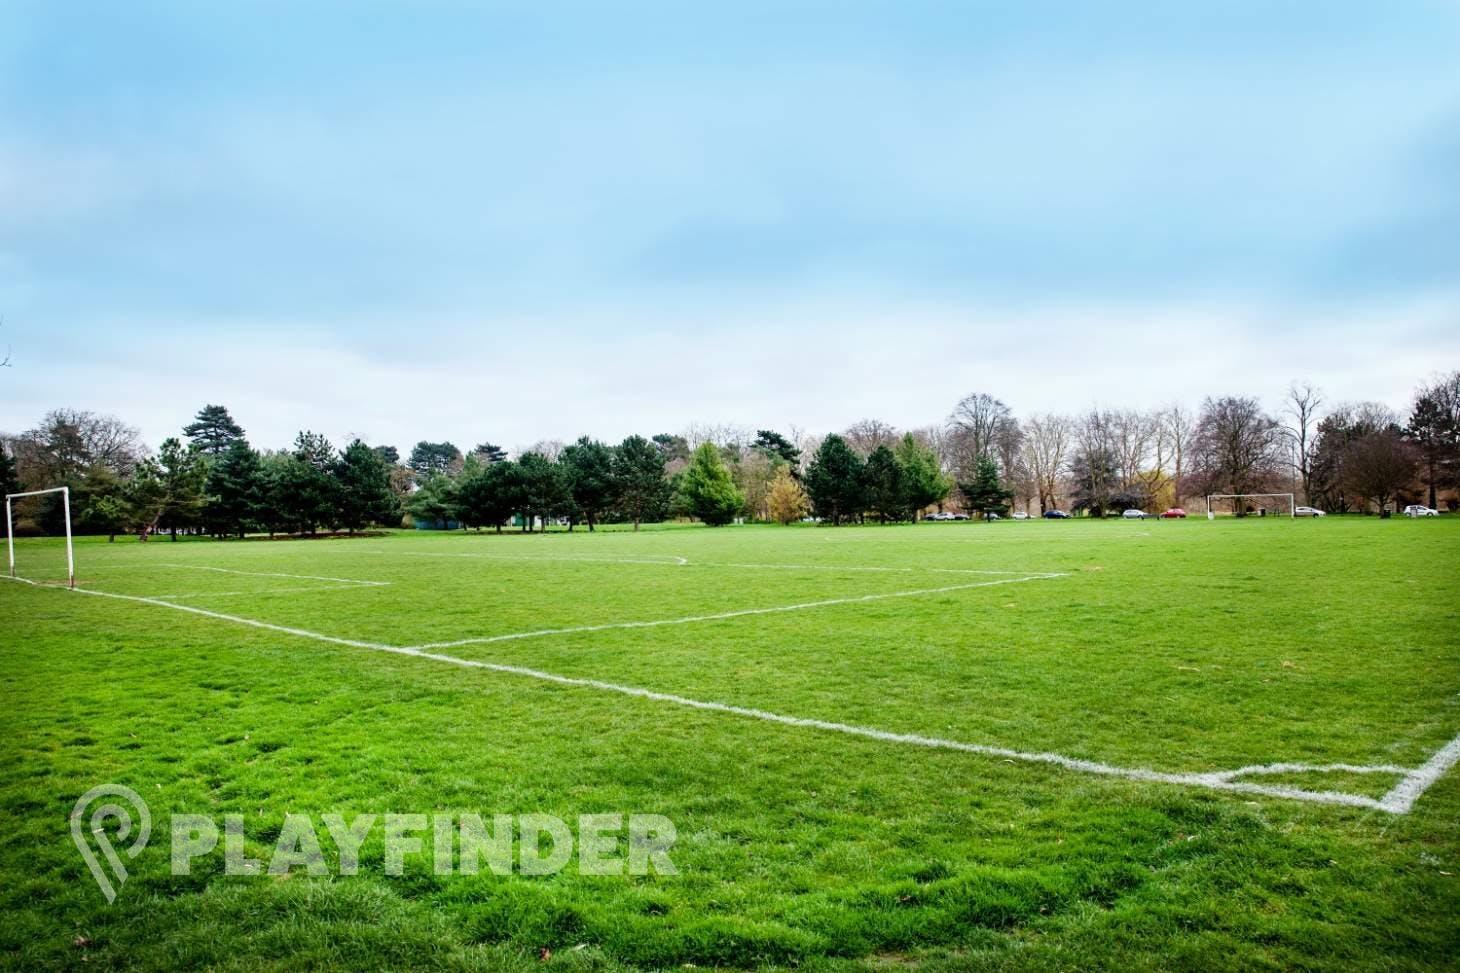 Russell Park 11 a side | Grass football pitch